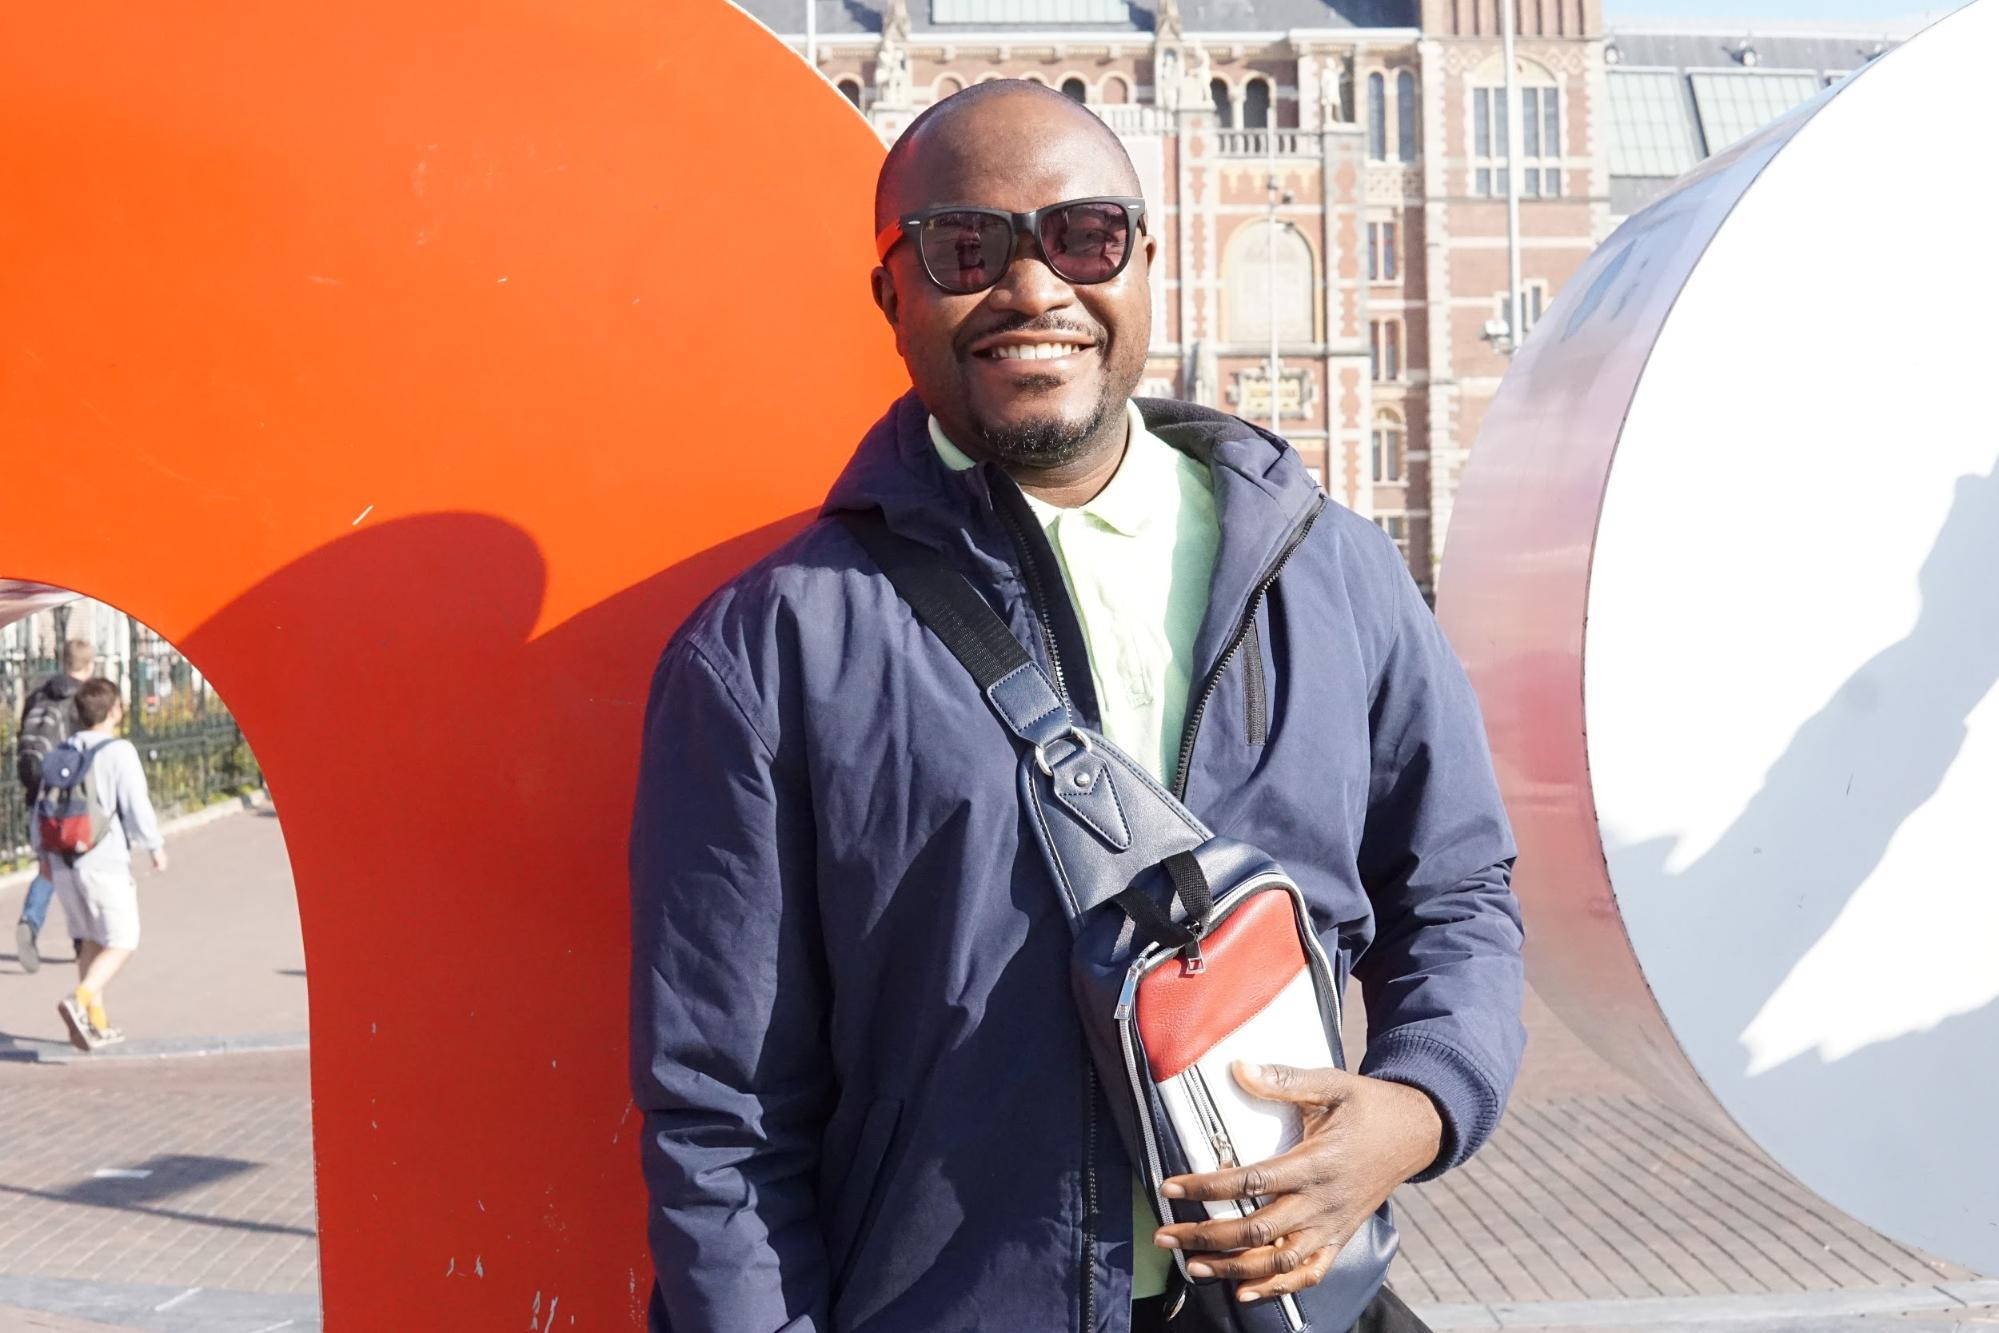 Charles (37), Ghana